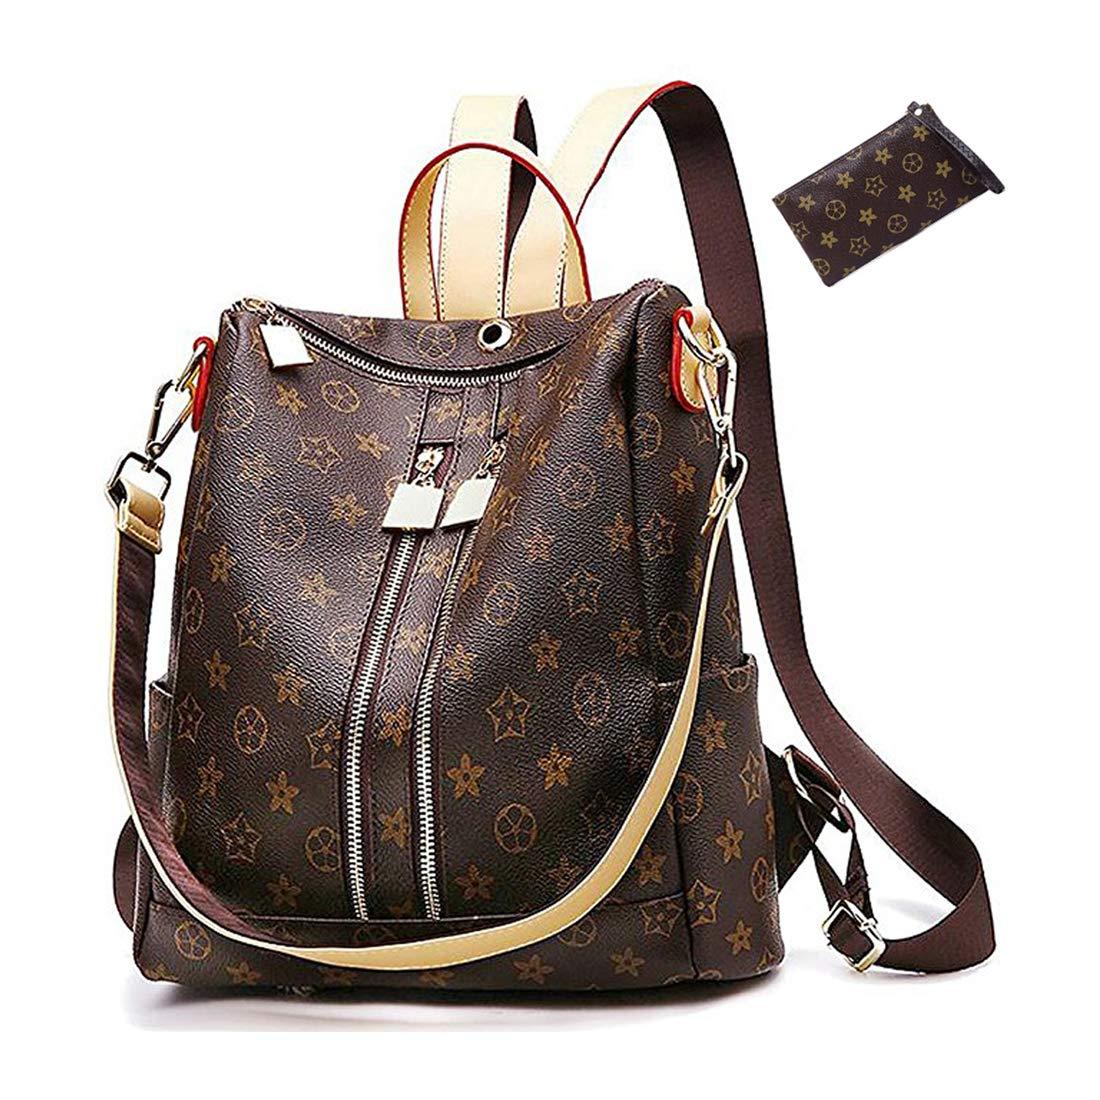 98c2c6281d3 Casual Purse Fashion School Leather Backpack Crossbady Shoulder Bag Mini  Backpack for Women & Teenage Girls BLACK BROWN